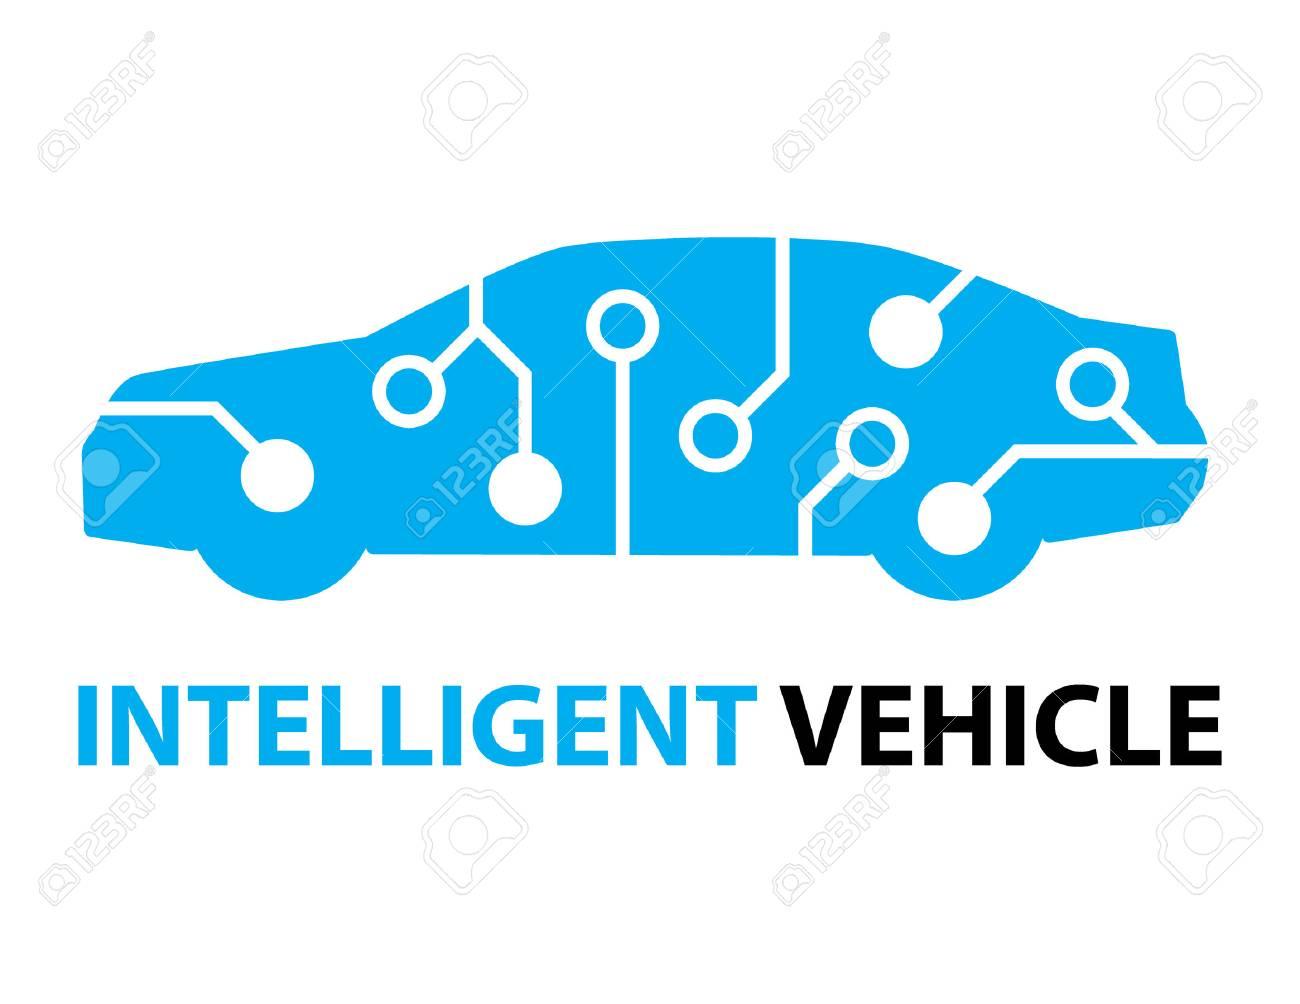 smart car,Intelligent Vehicle icon and symbol - 63399416